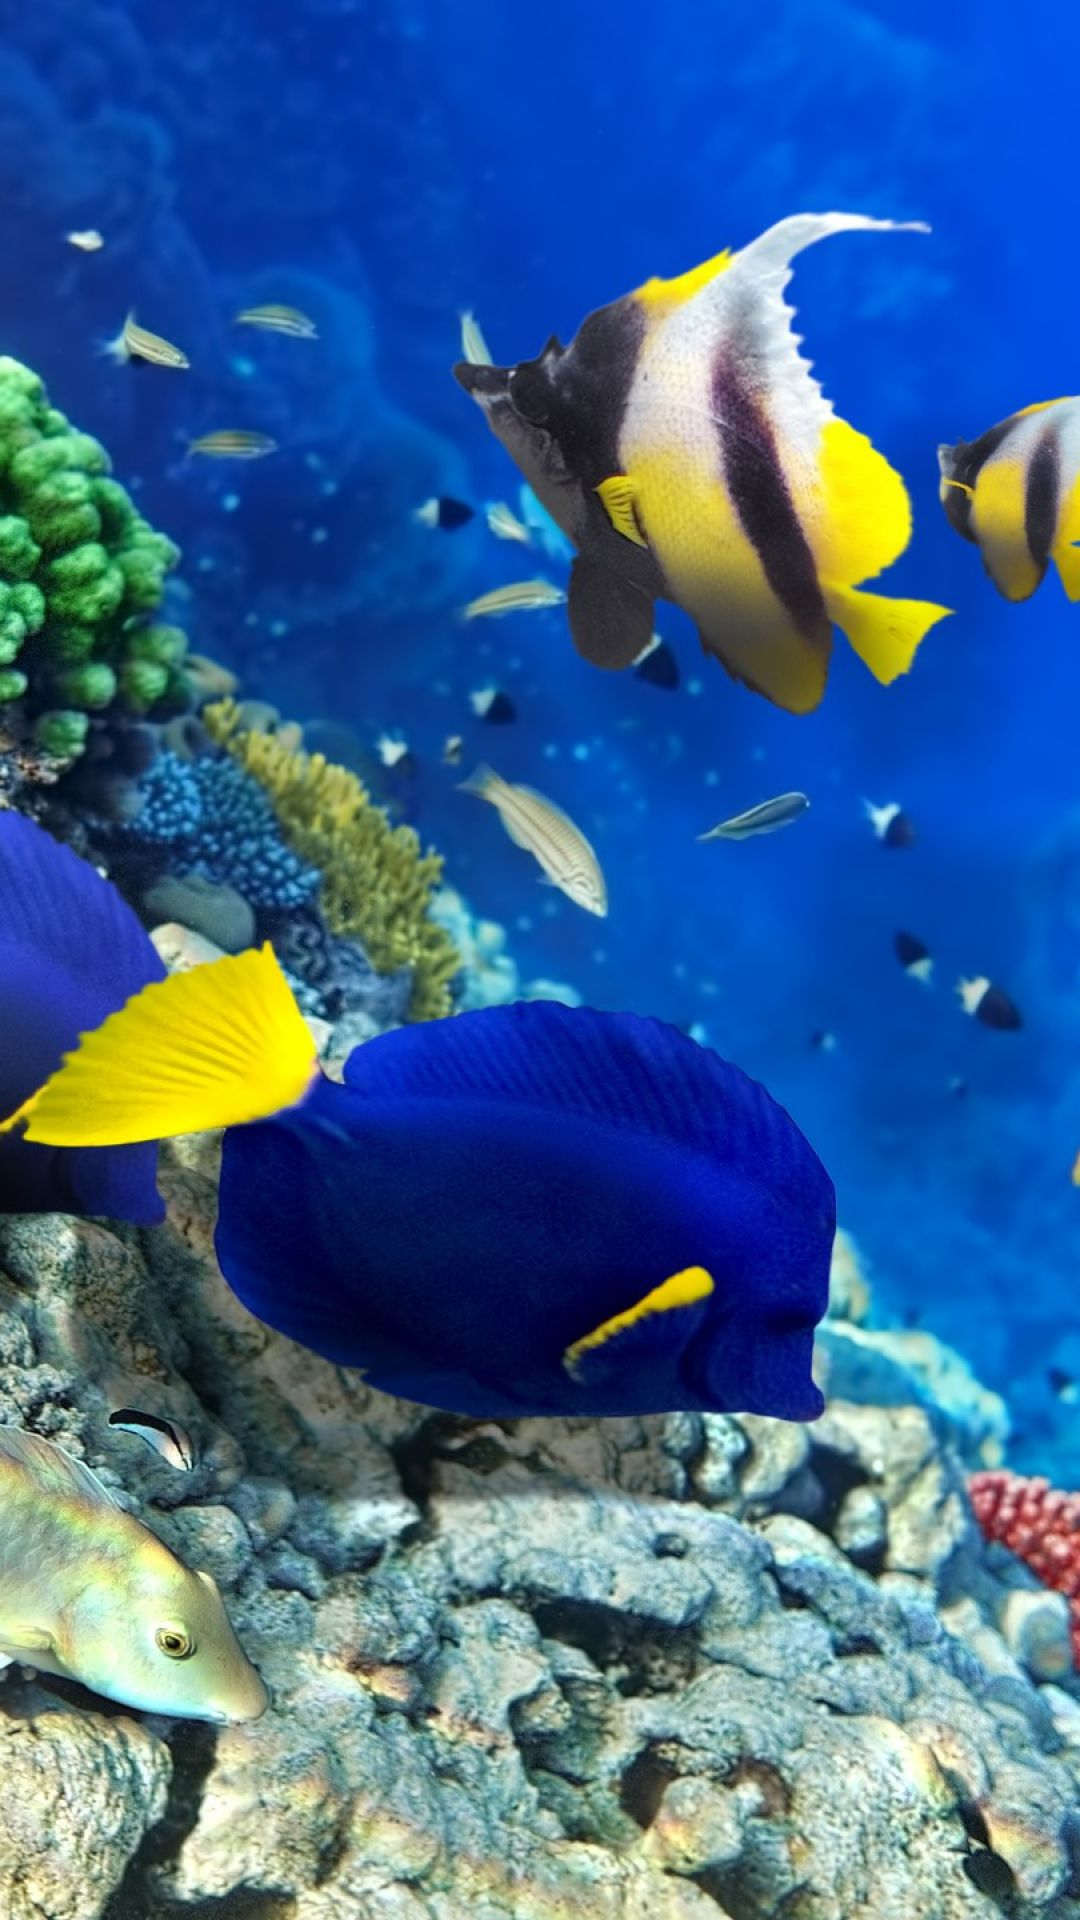 Download Wallpaper 1080x1920 Fish Algae Corals Underwater Sony Xperia Z1 Zl Z Samsung Galaxy S4 Htc One Hd Backgroun Ocean Creatures Sea Fish Underwater Ocean underwater life fish corals algae